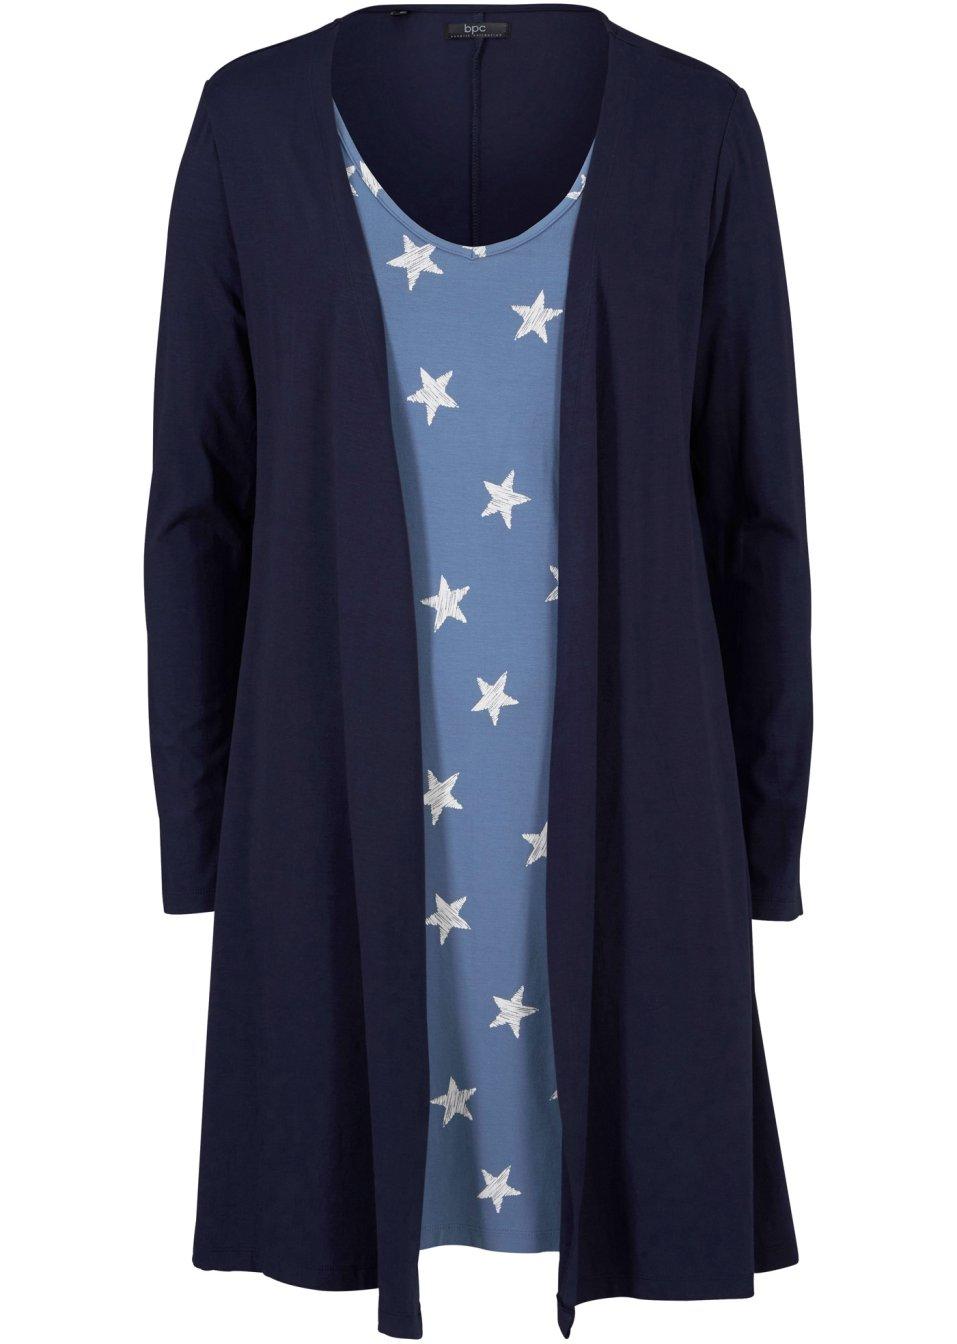 2 in 1 Kleid Langarm dunkelblau/jeansblau/weiß bedruckt - bpc bonprix collection online bestellen - bonprix.de evBsS GdGgi